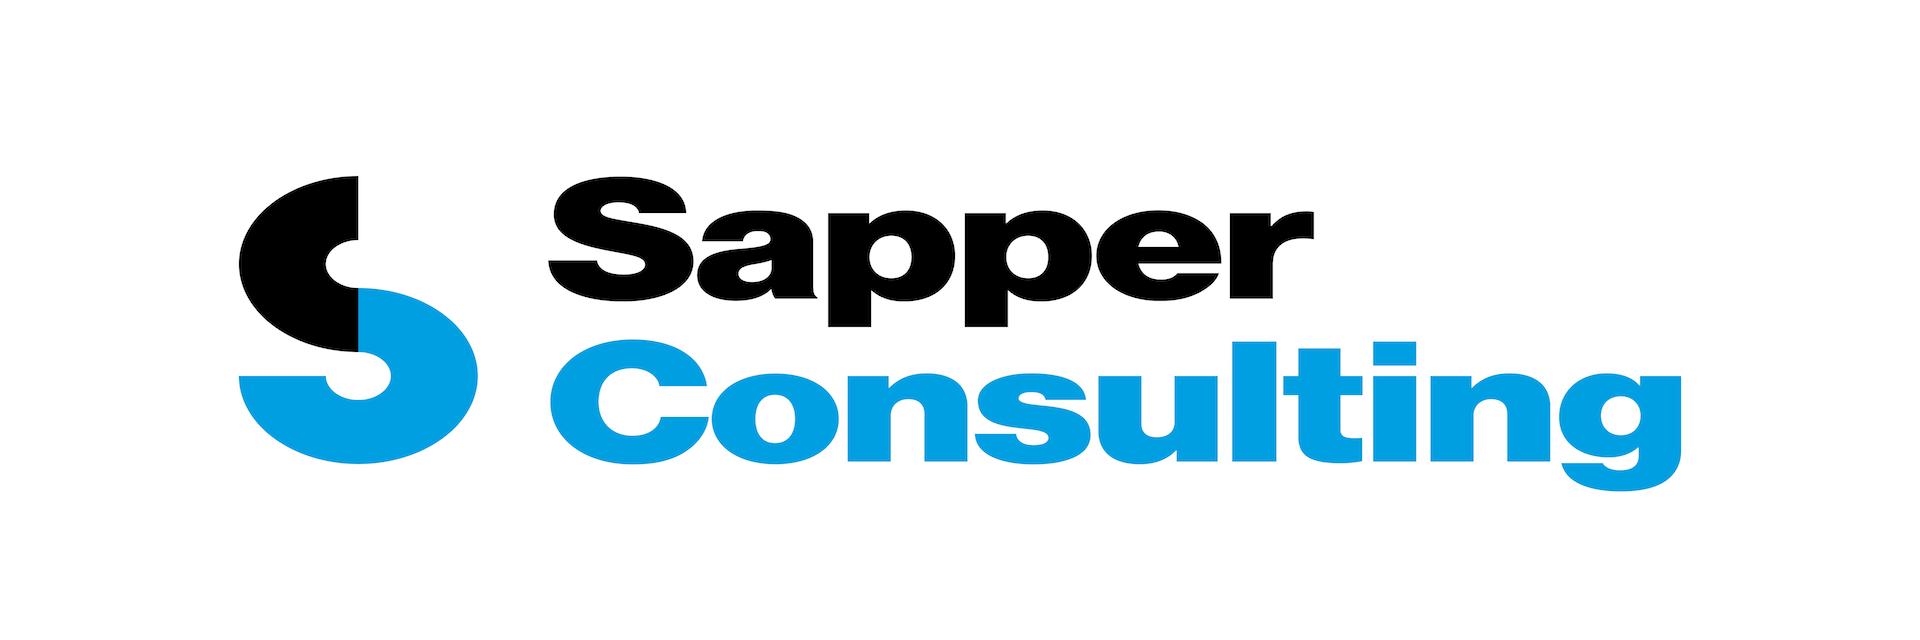 Sapper consulting logo